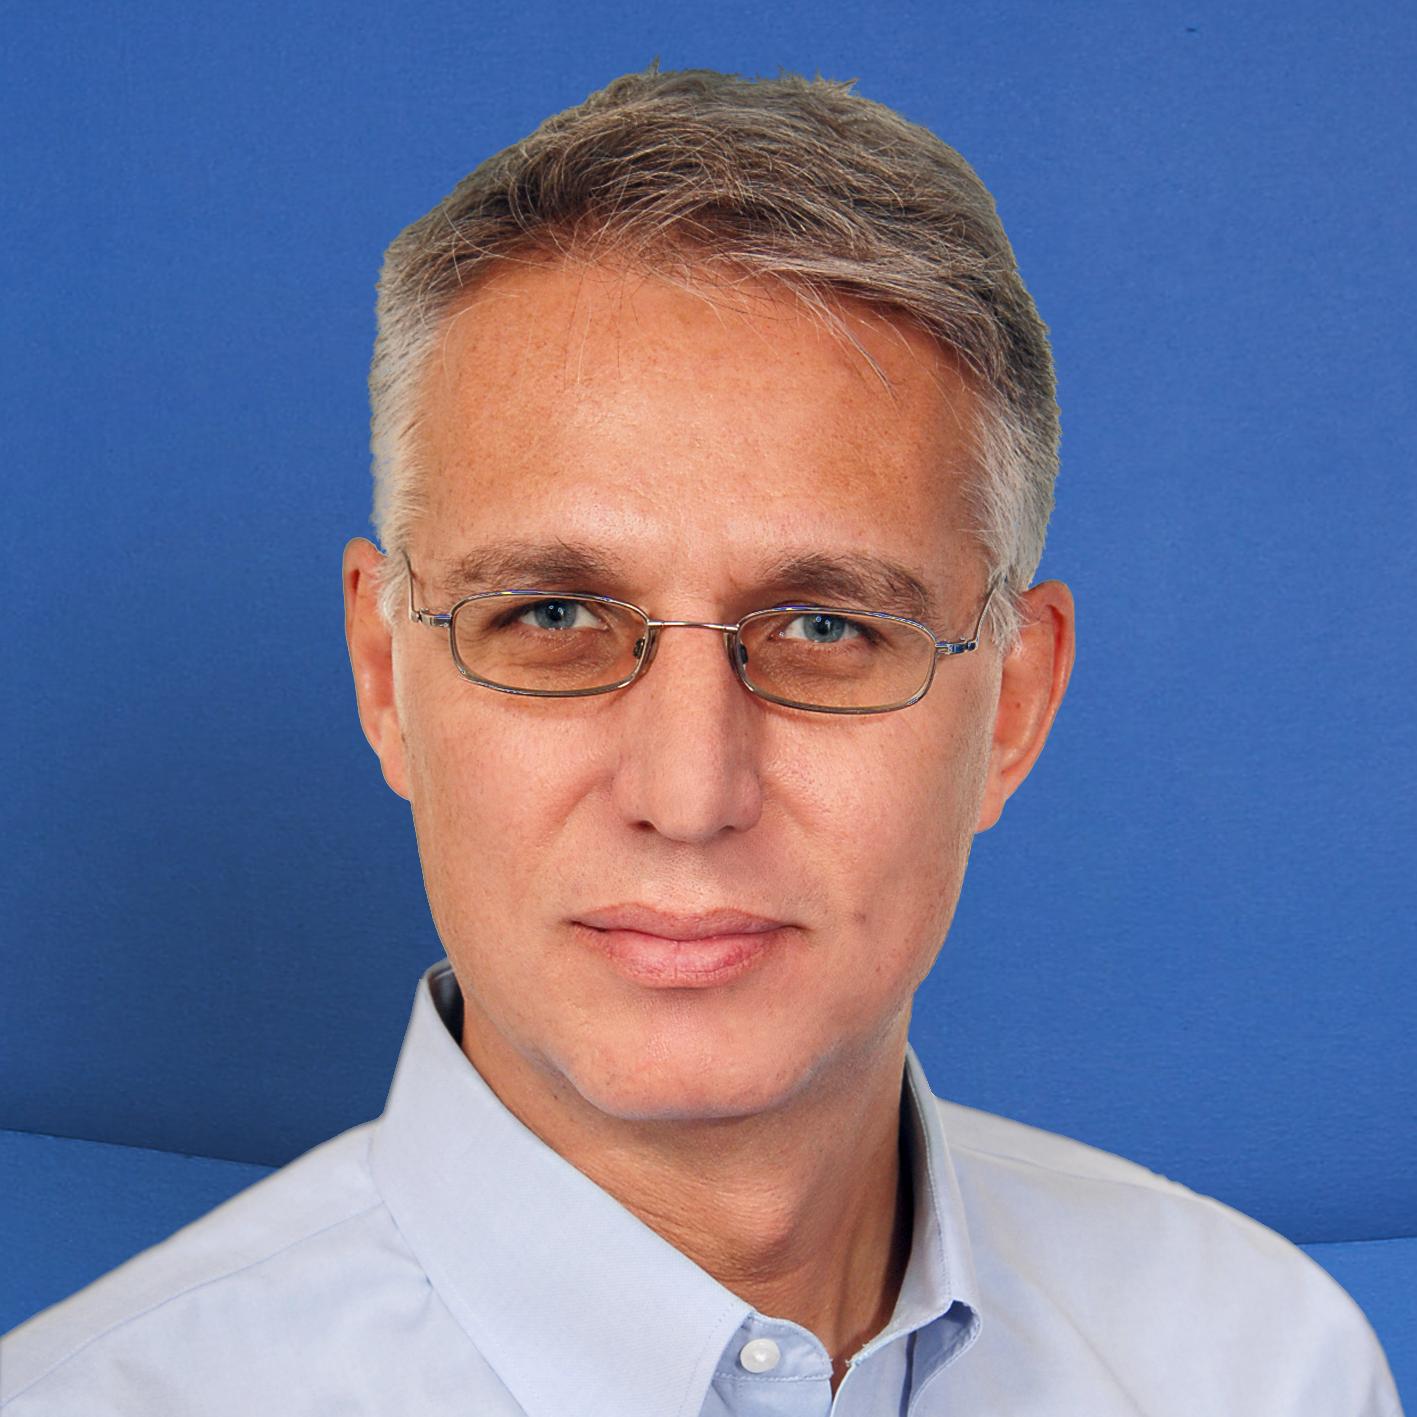 Portrait of George Totev